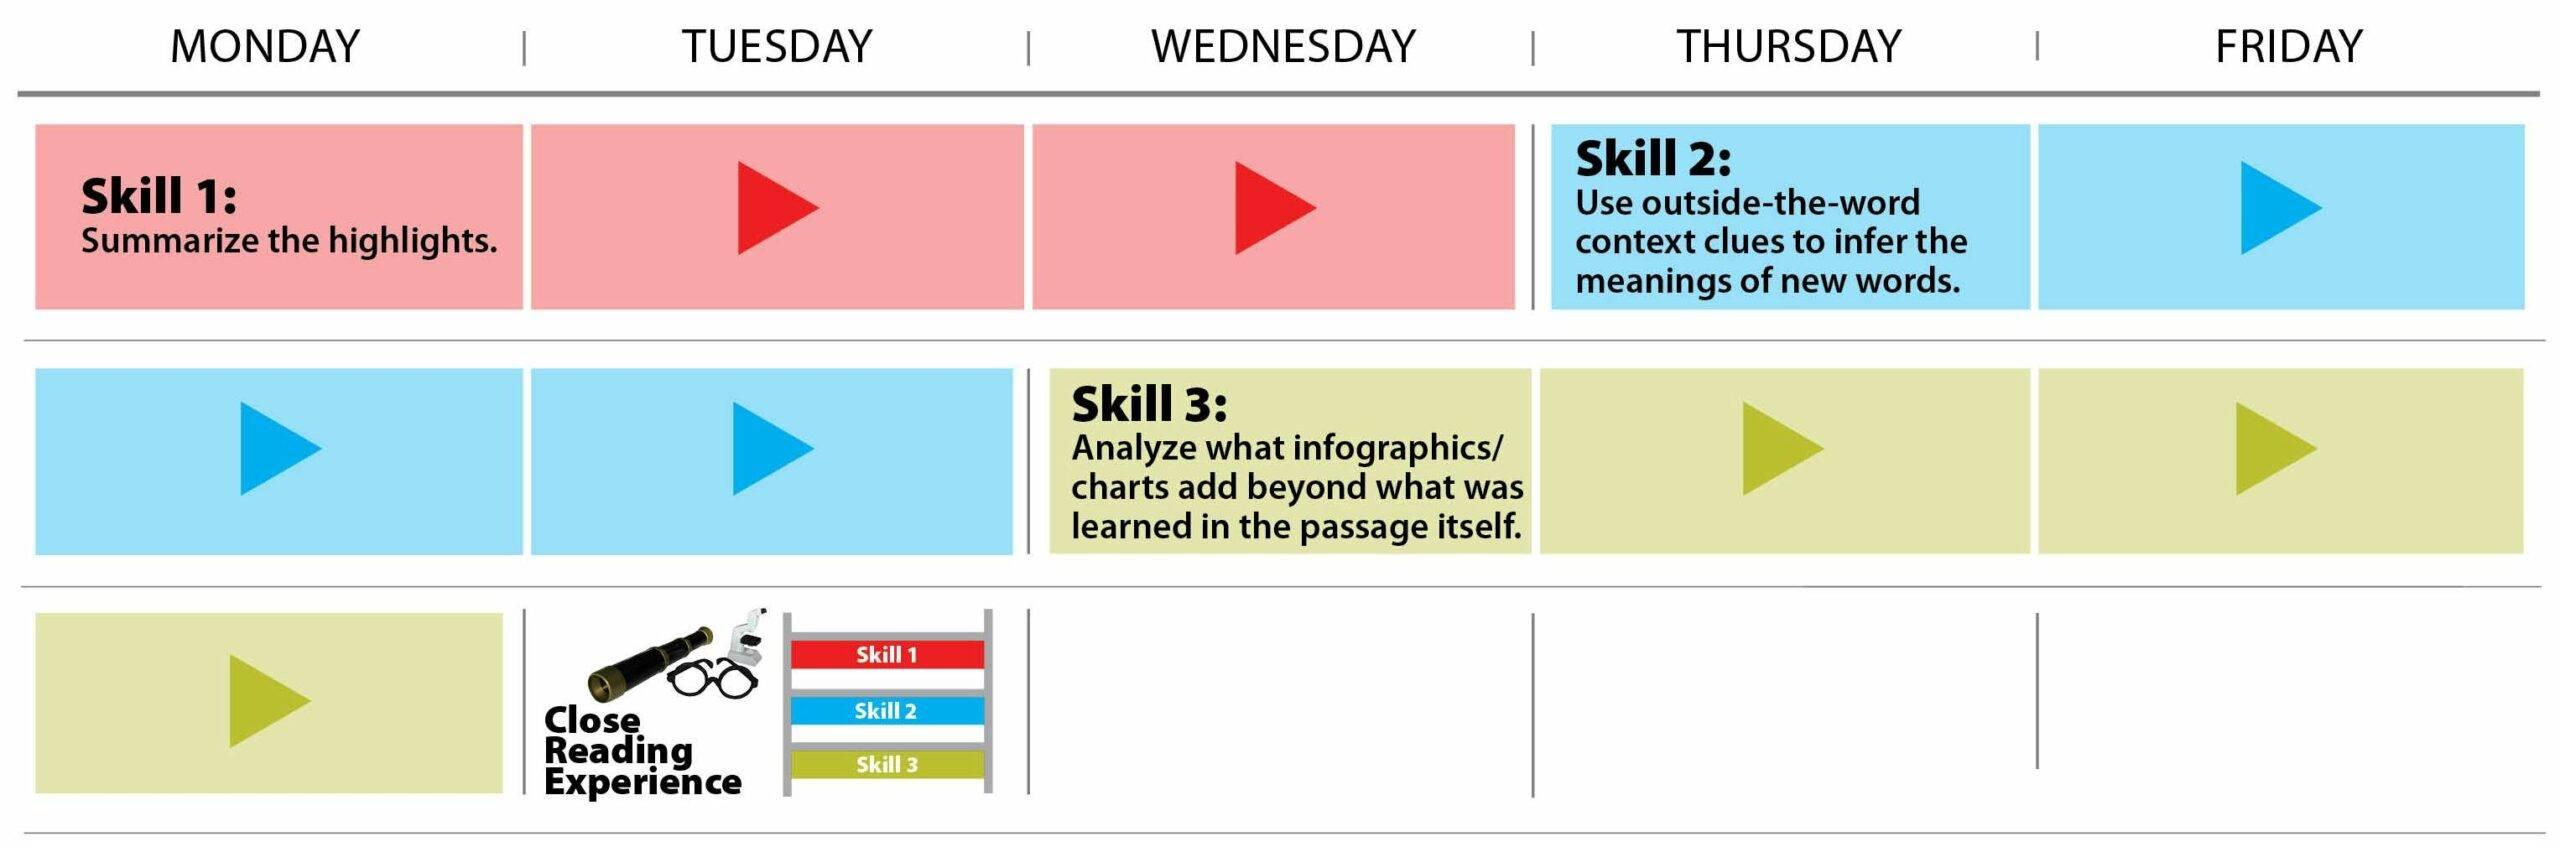 Sample calendar (1) for Close-Reading Experiences